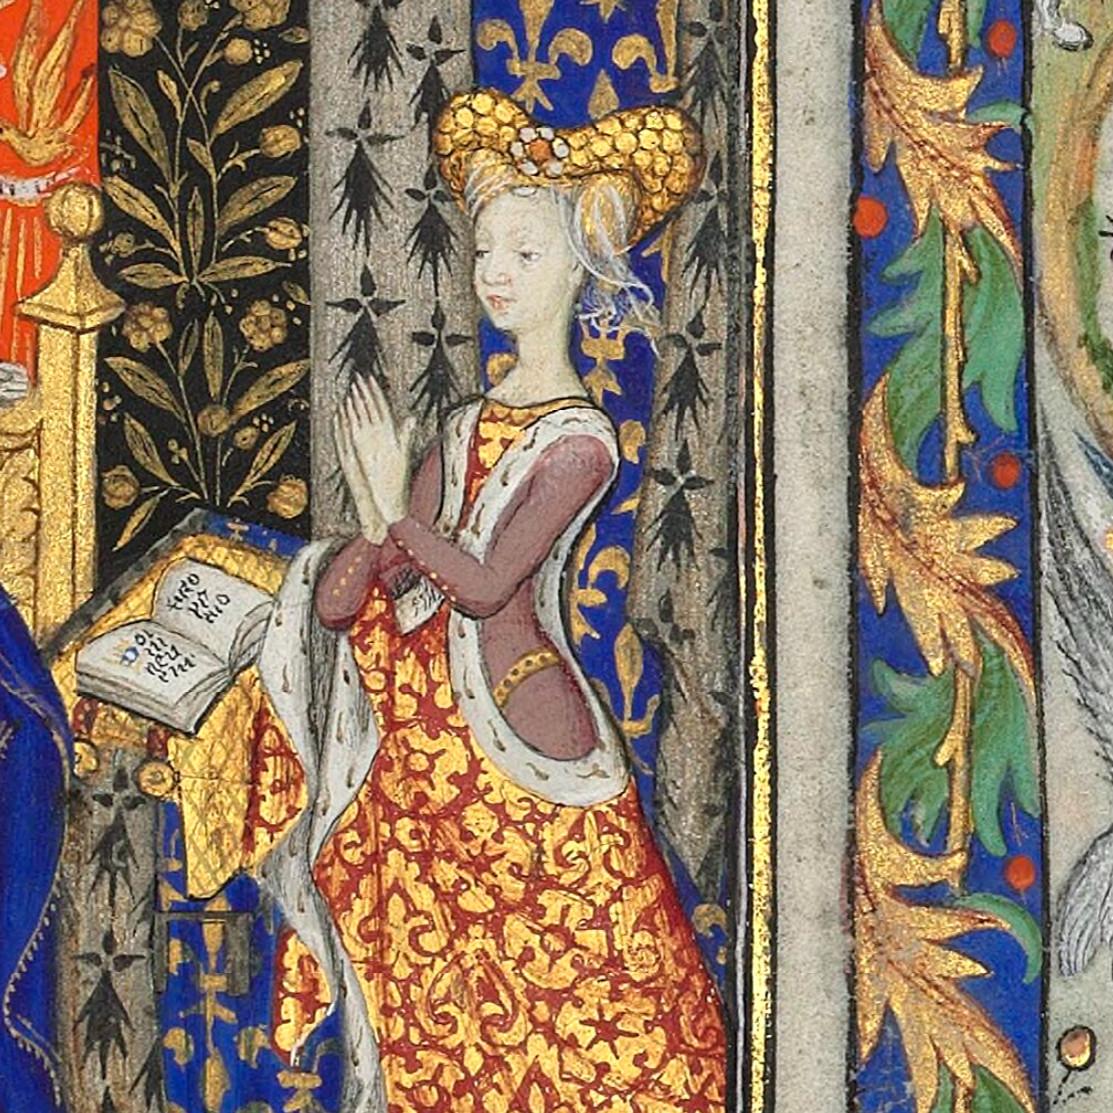 Margaret, Countess of Vertus